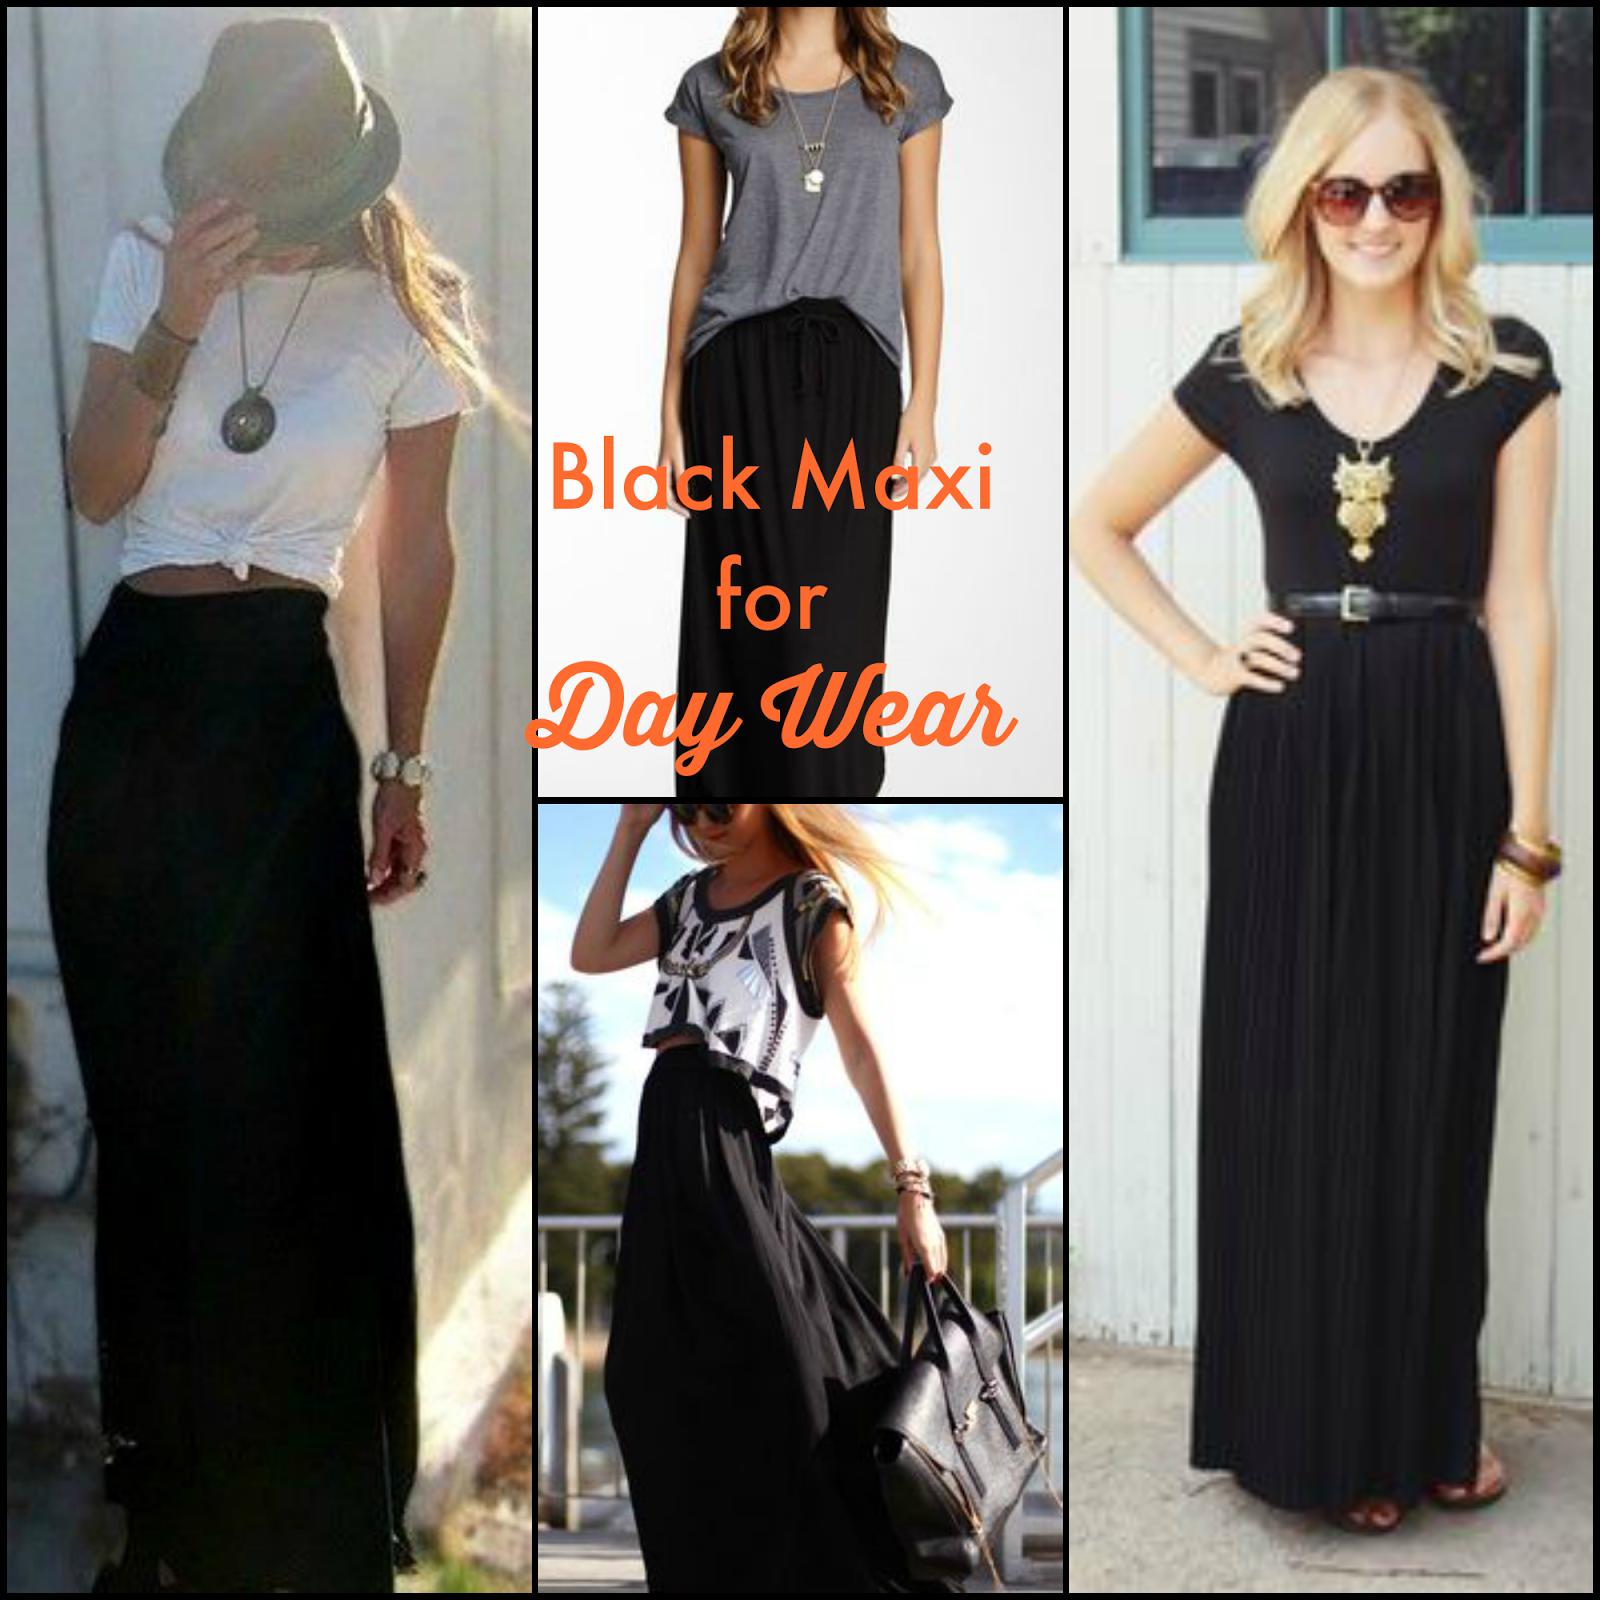 Can i wear a black maxi dress to a wedding